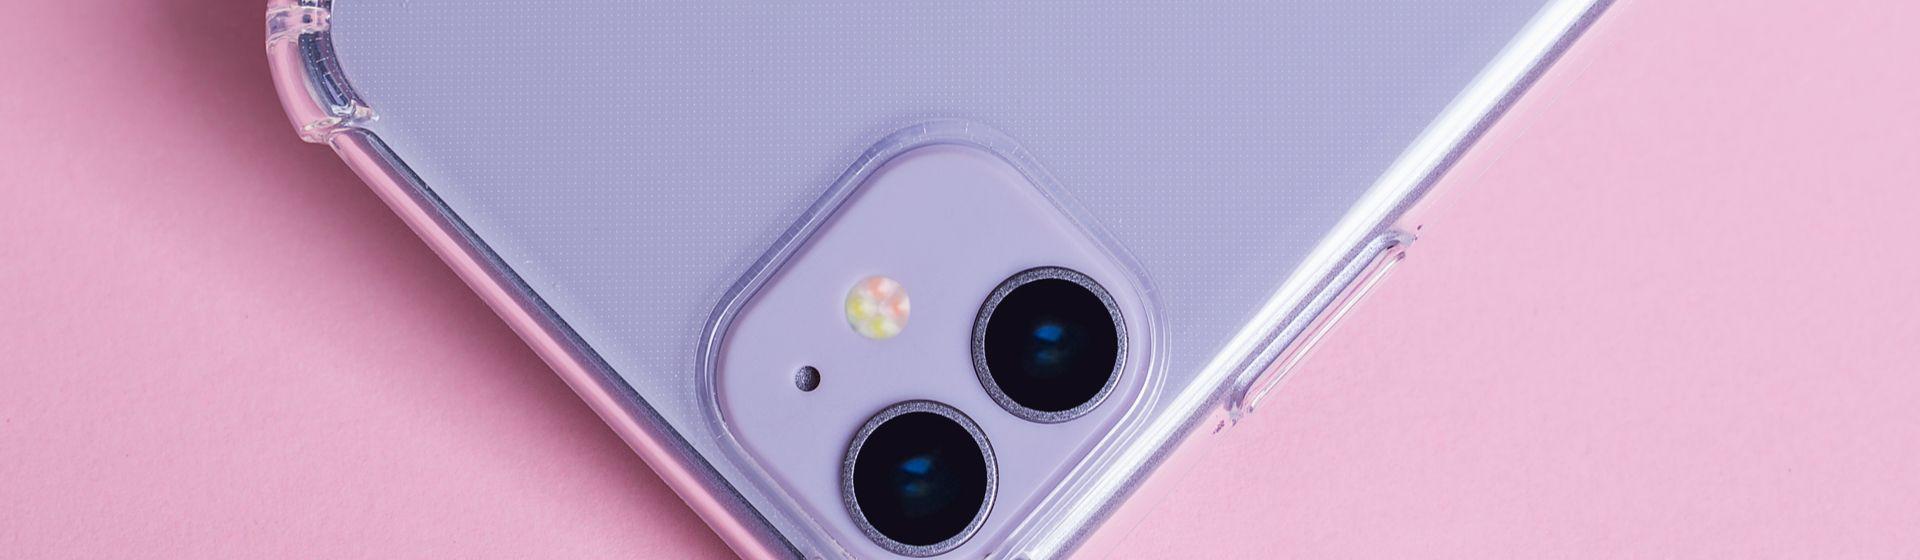 Capa para iPhone 11: 5 modelos para comprar no Brasil